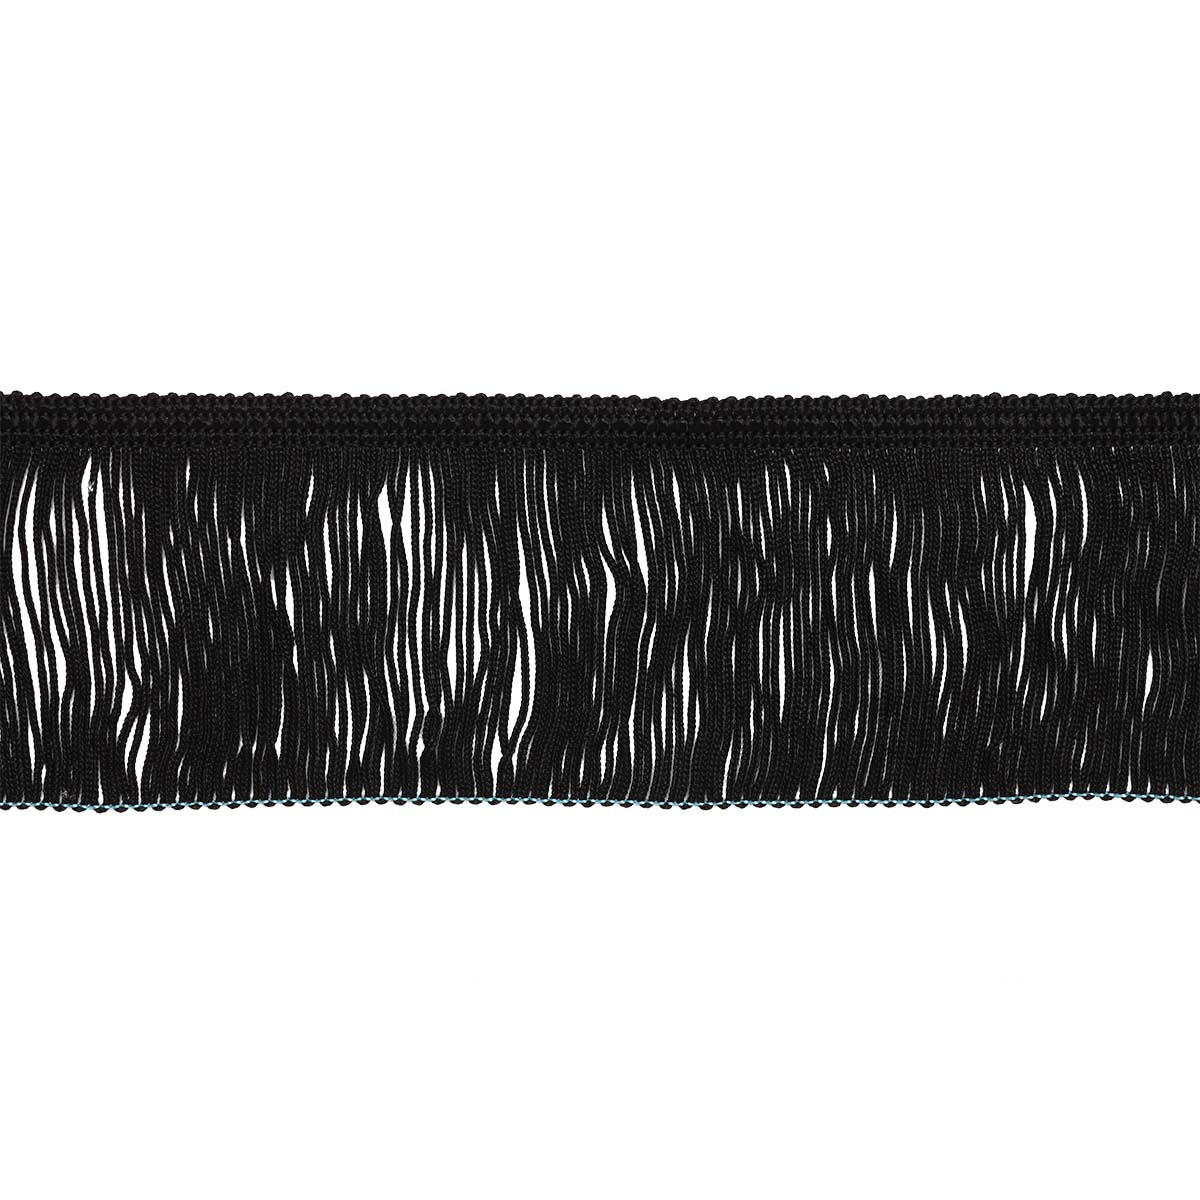 2.227Р Бахрома 6см*10м (черный) фото